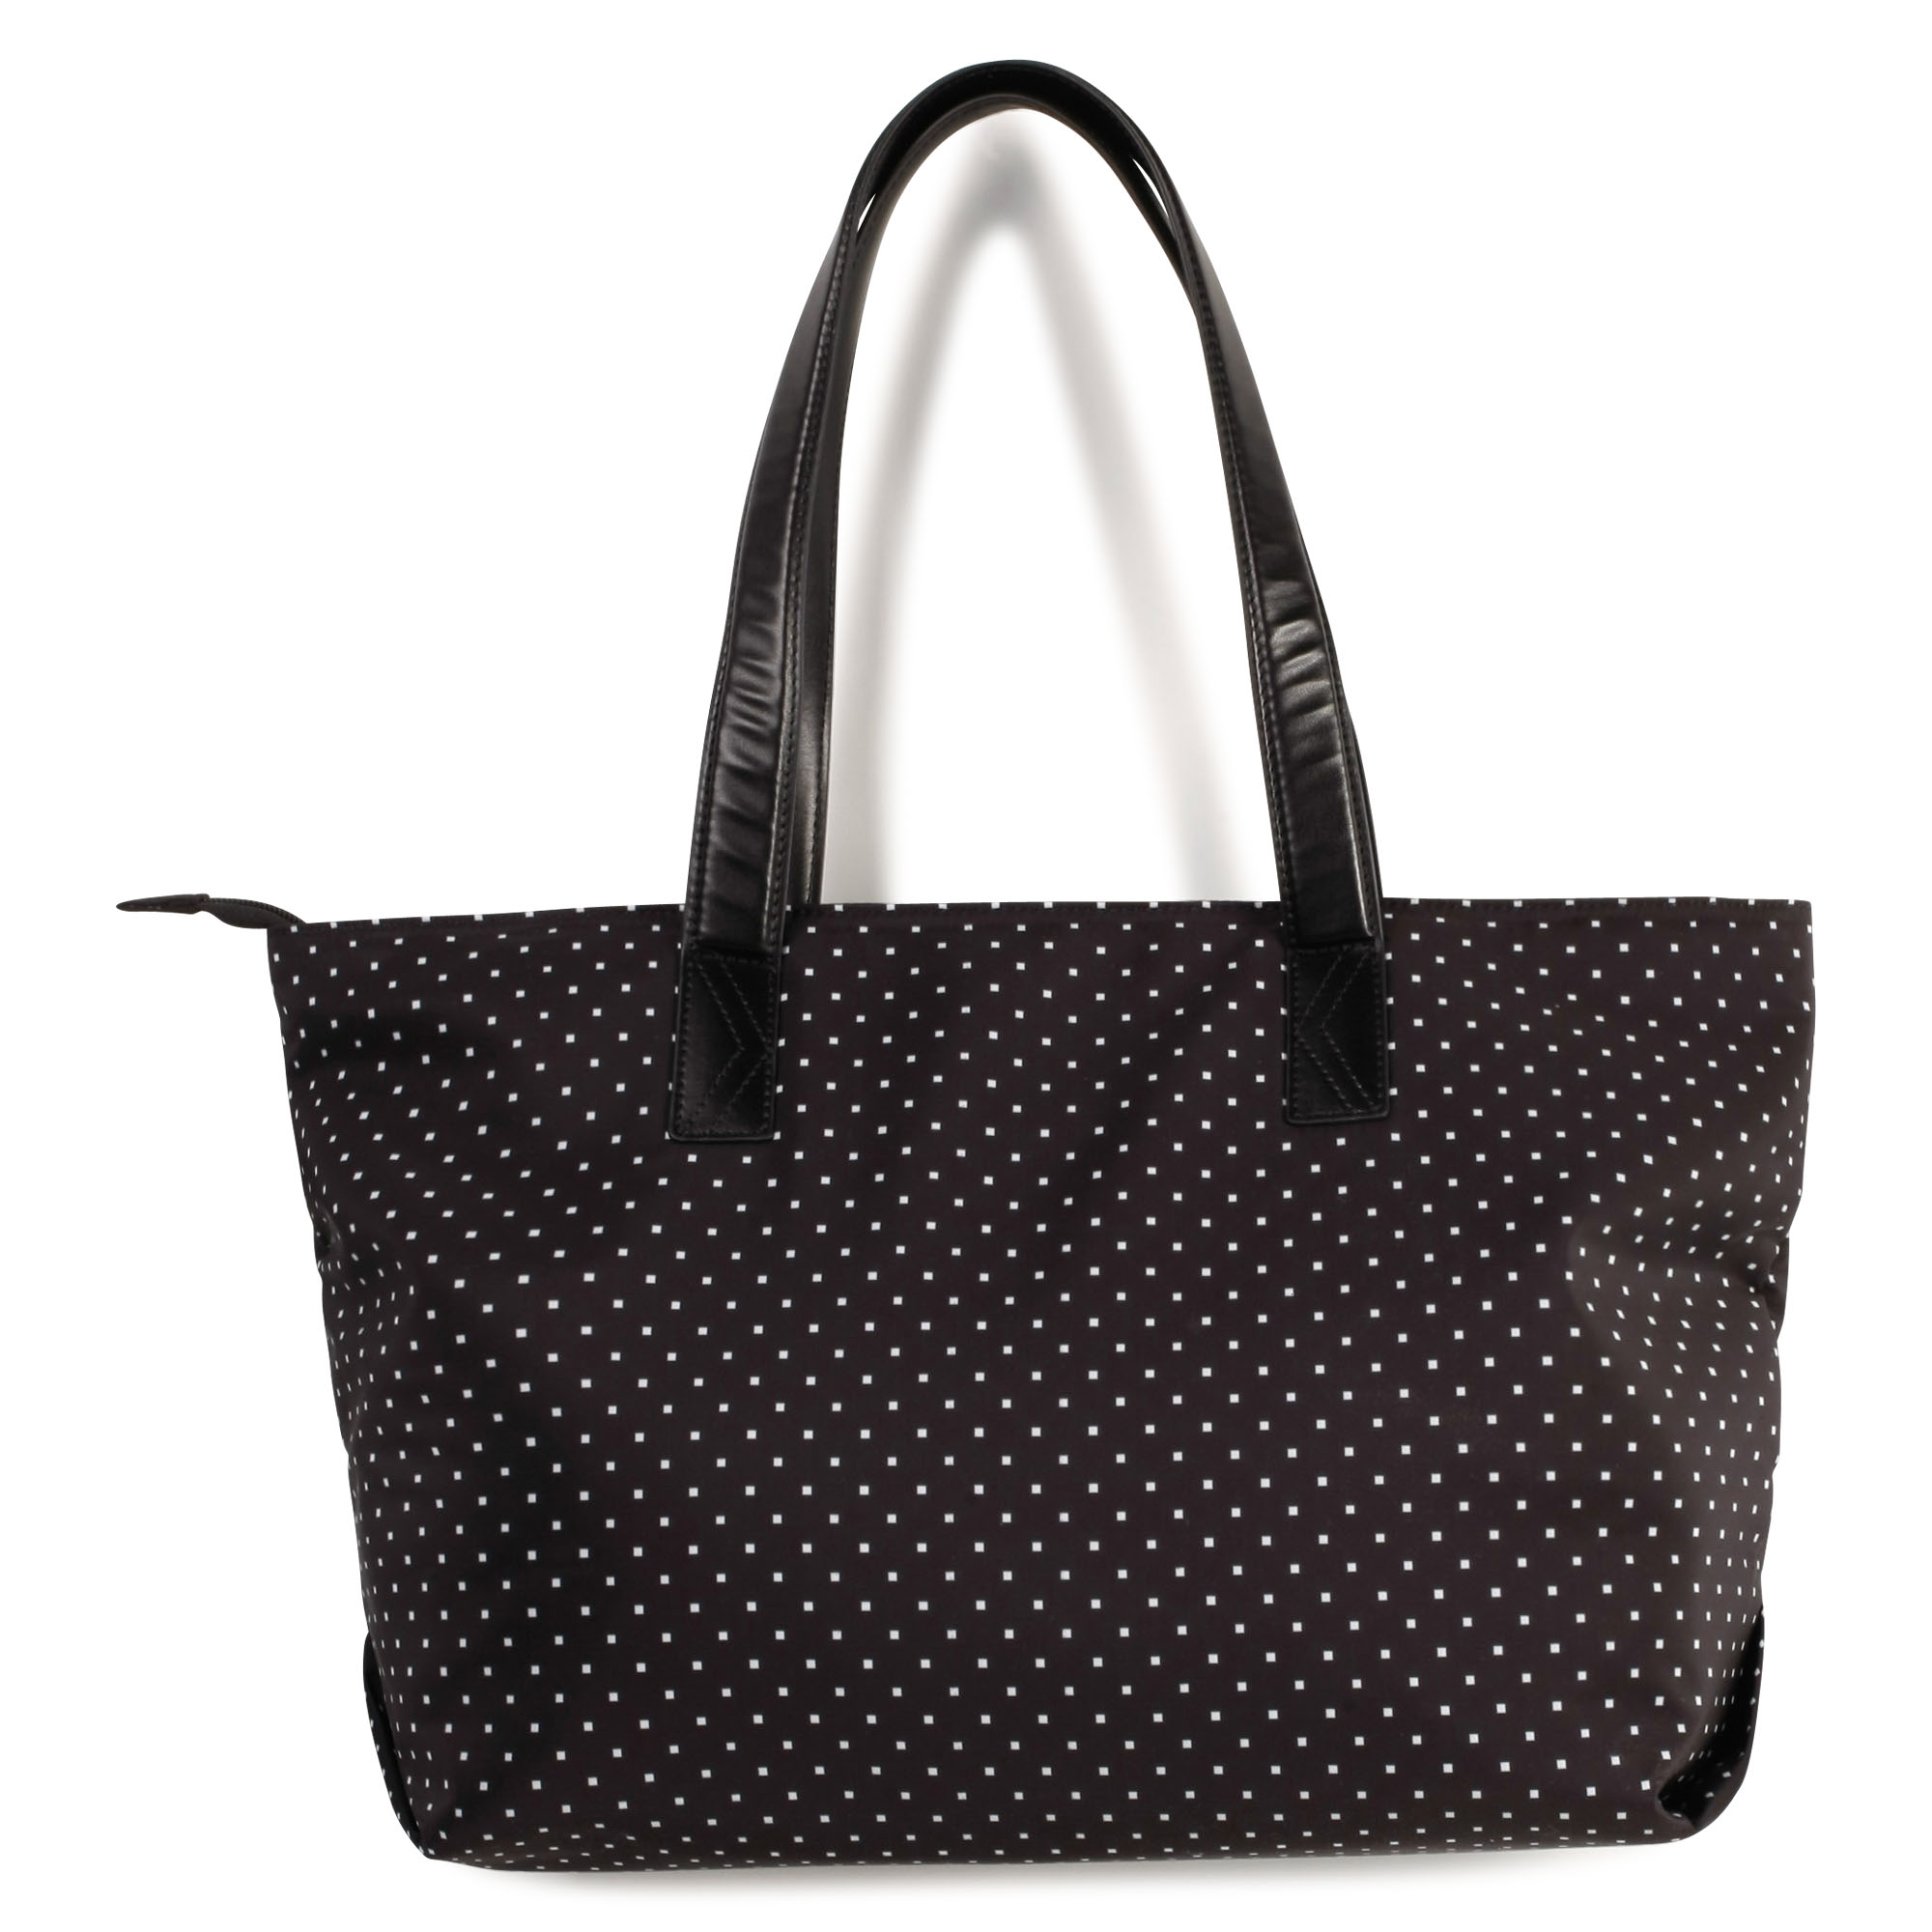 Coated polka dot tote bag KARL LAGERFELD KIDS for GIRL